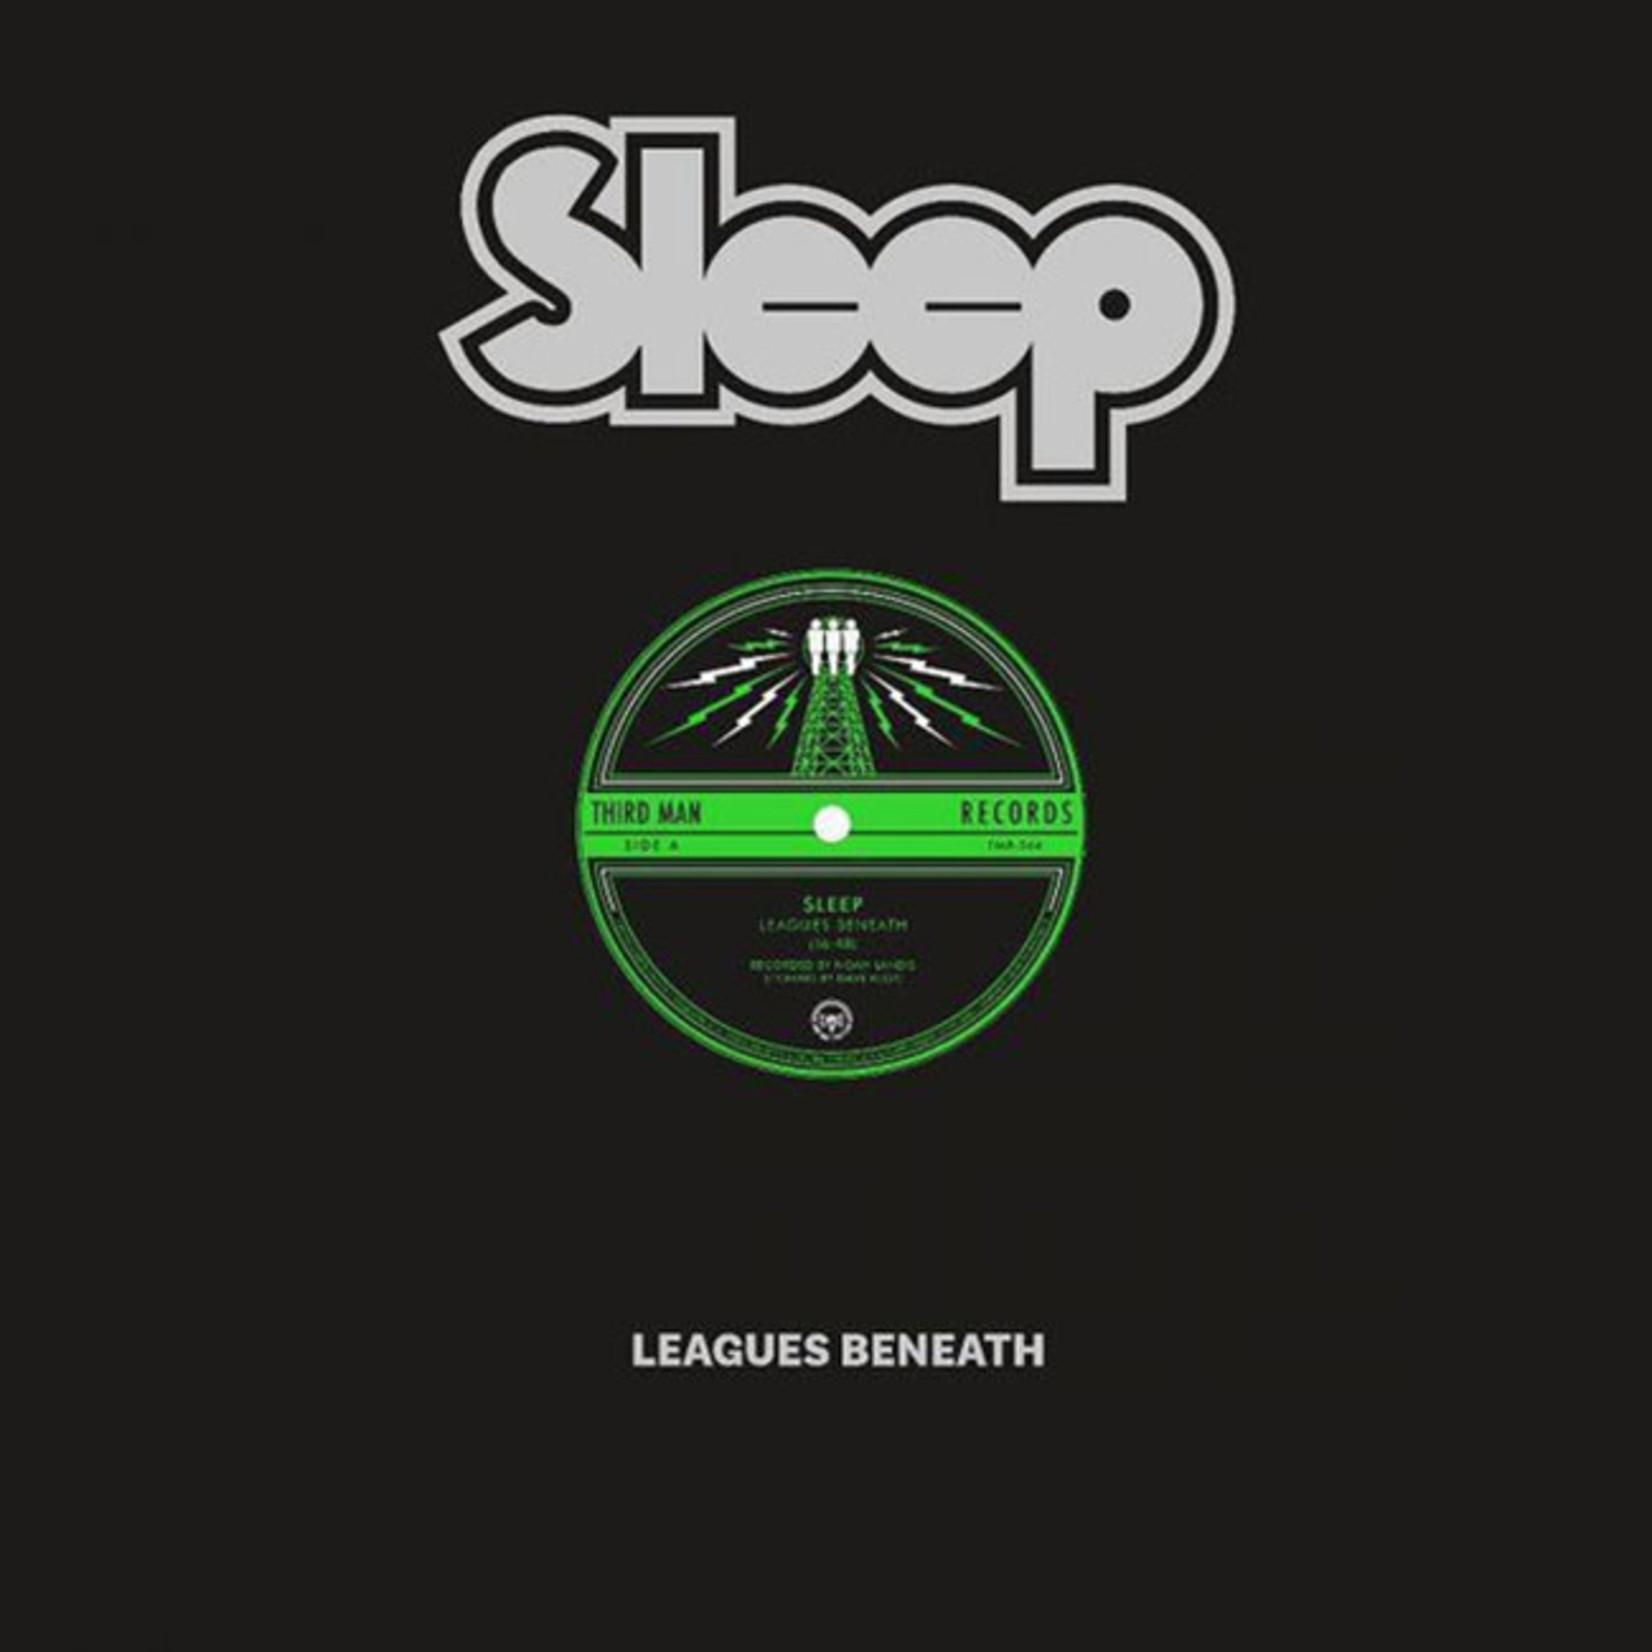 [New] Sleep: Leagues Beneath (12'')